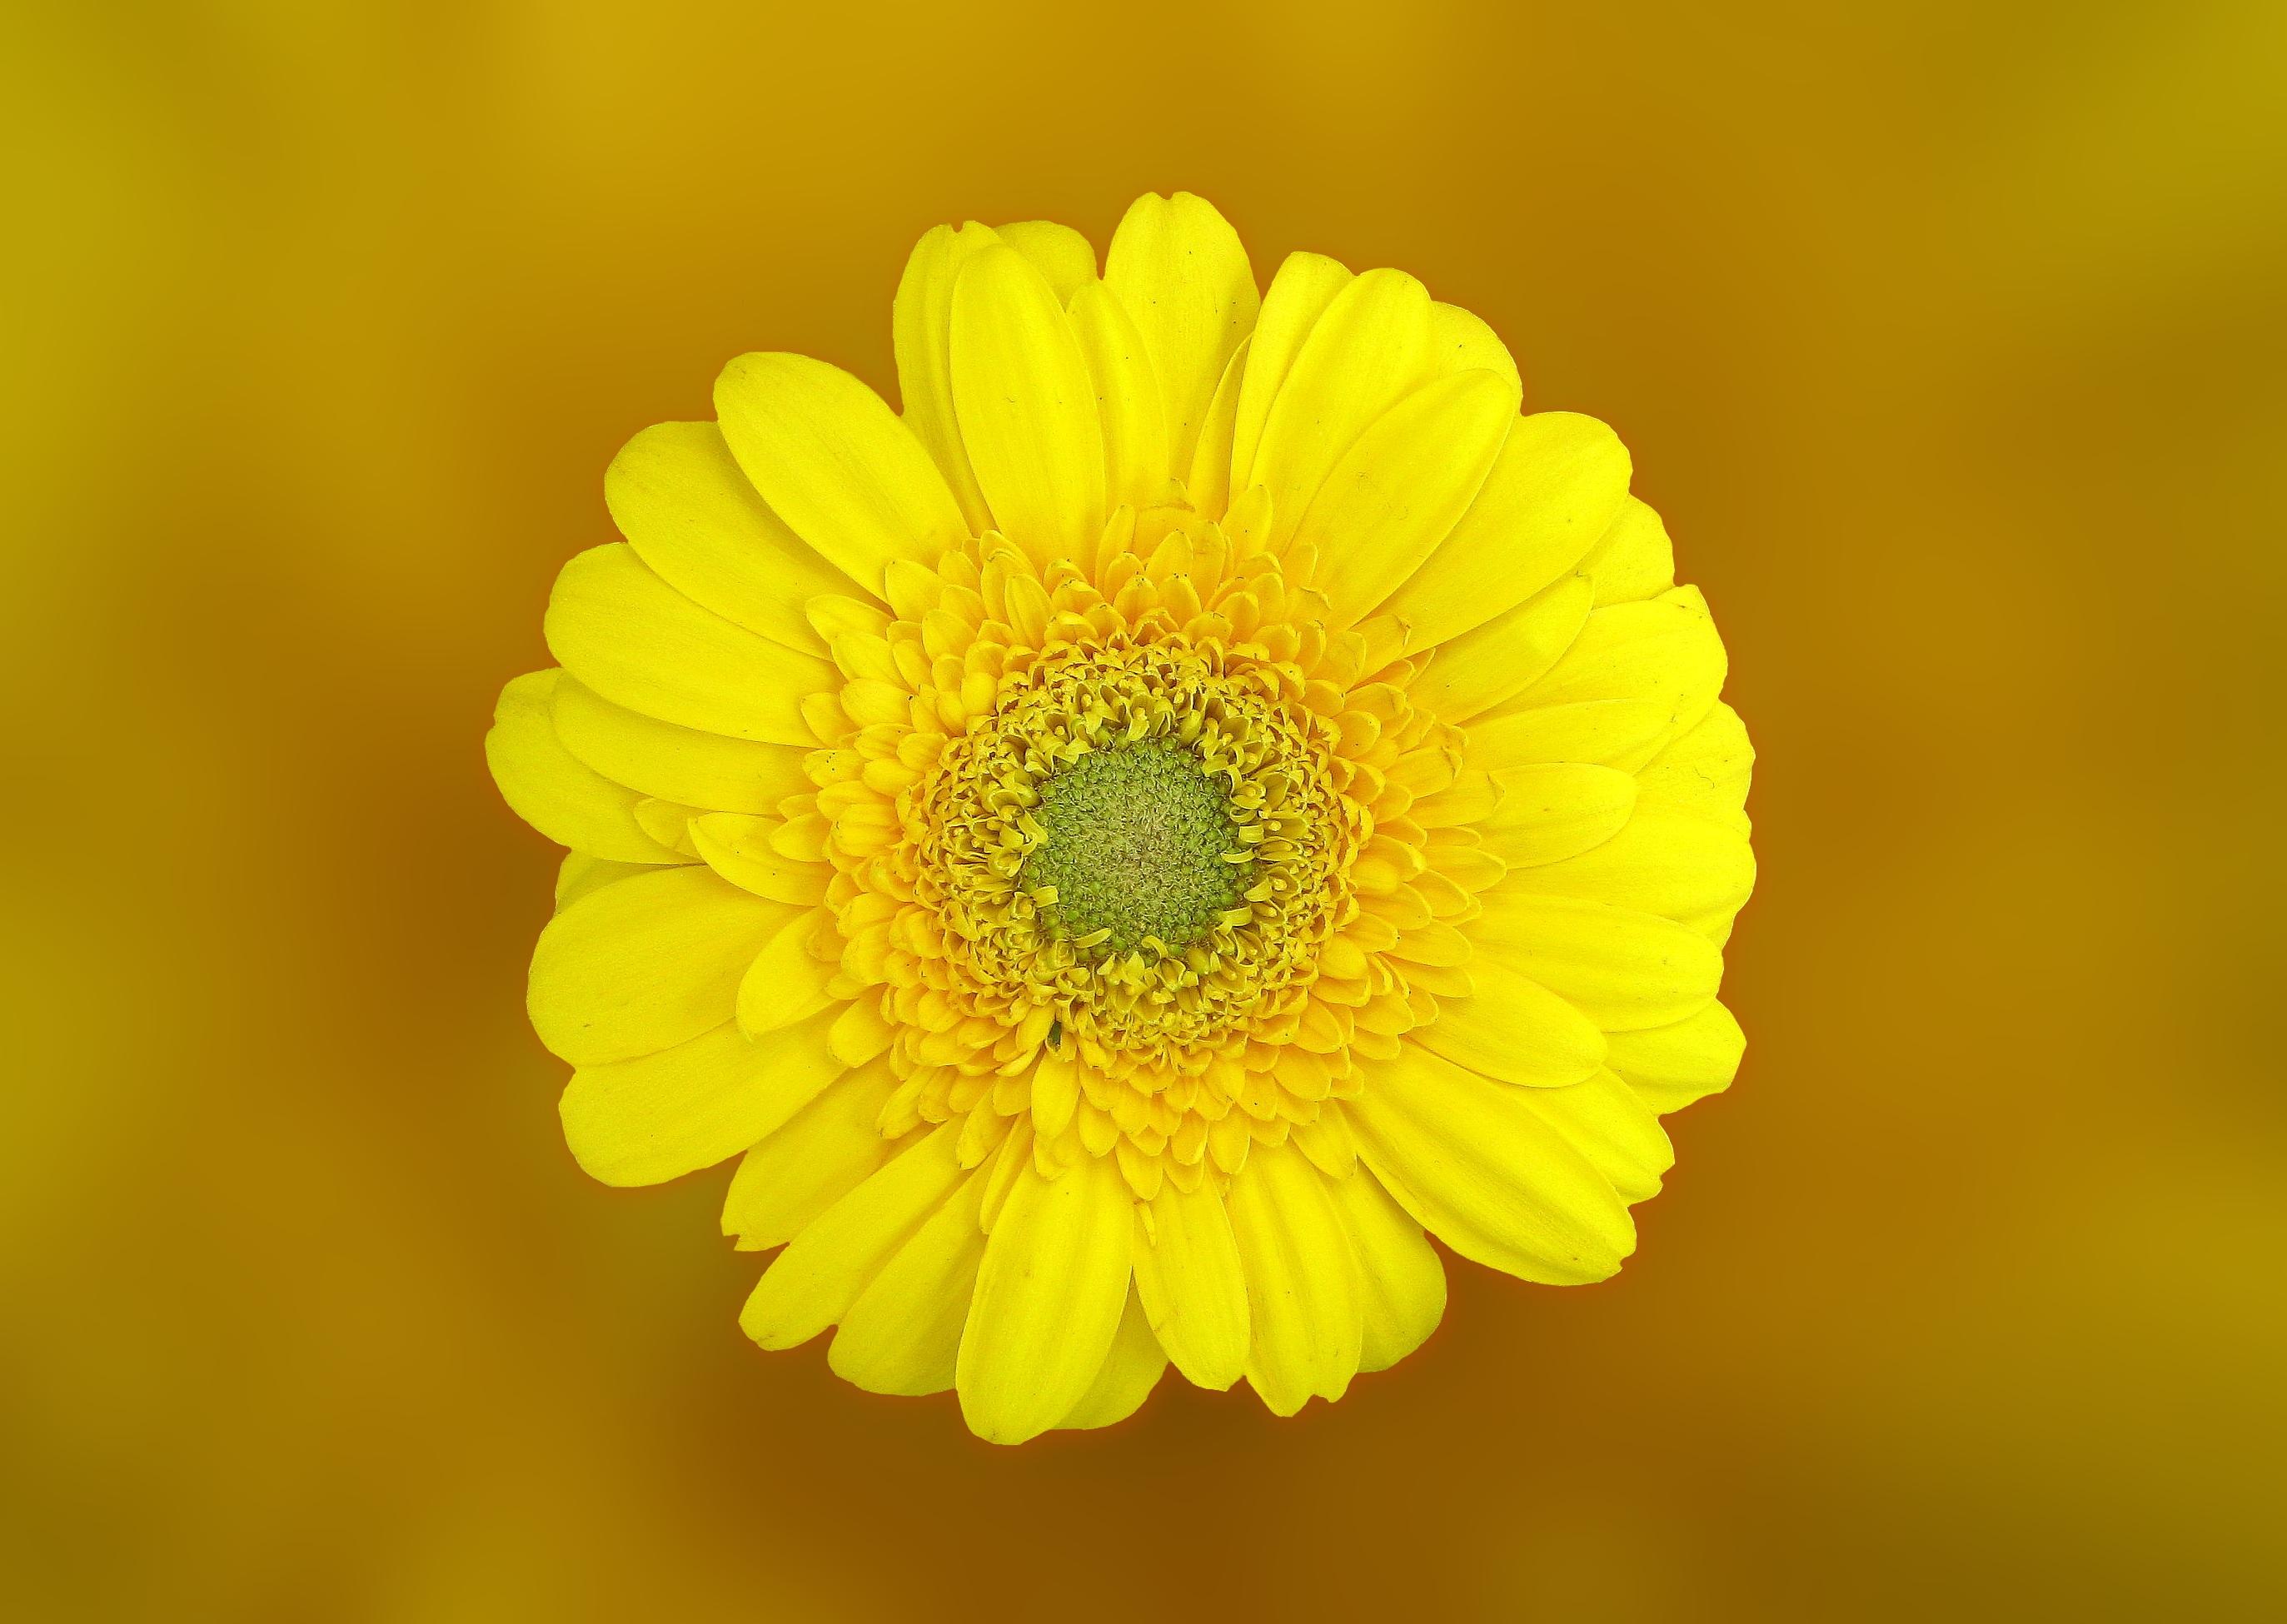 yellow daisy in macro shot free stock photo. Black Bedroom Furniture Sets. Home Design Ideas